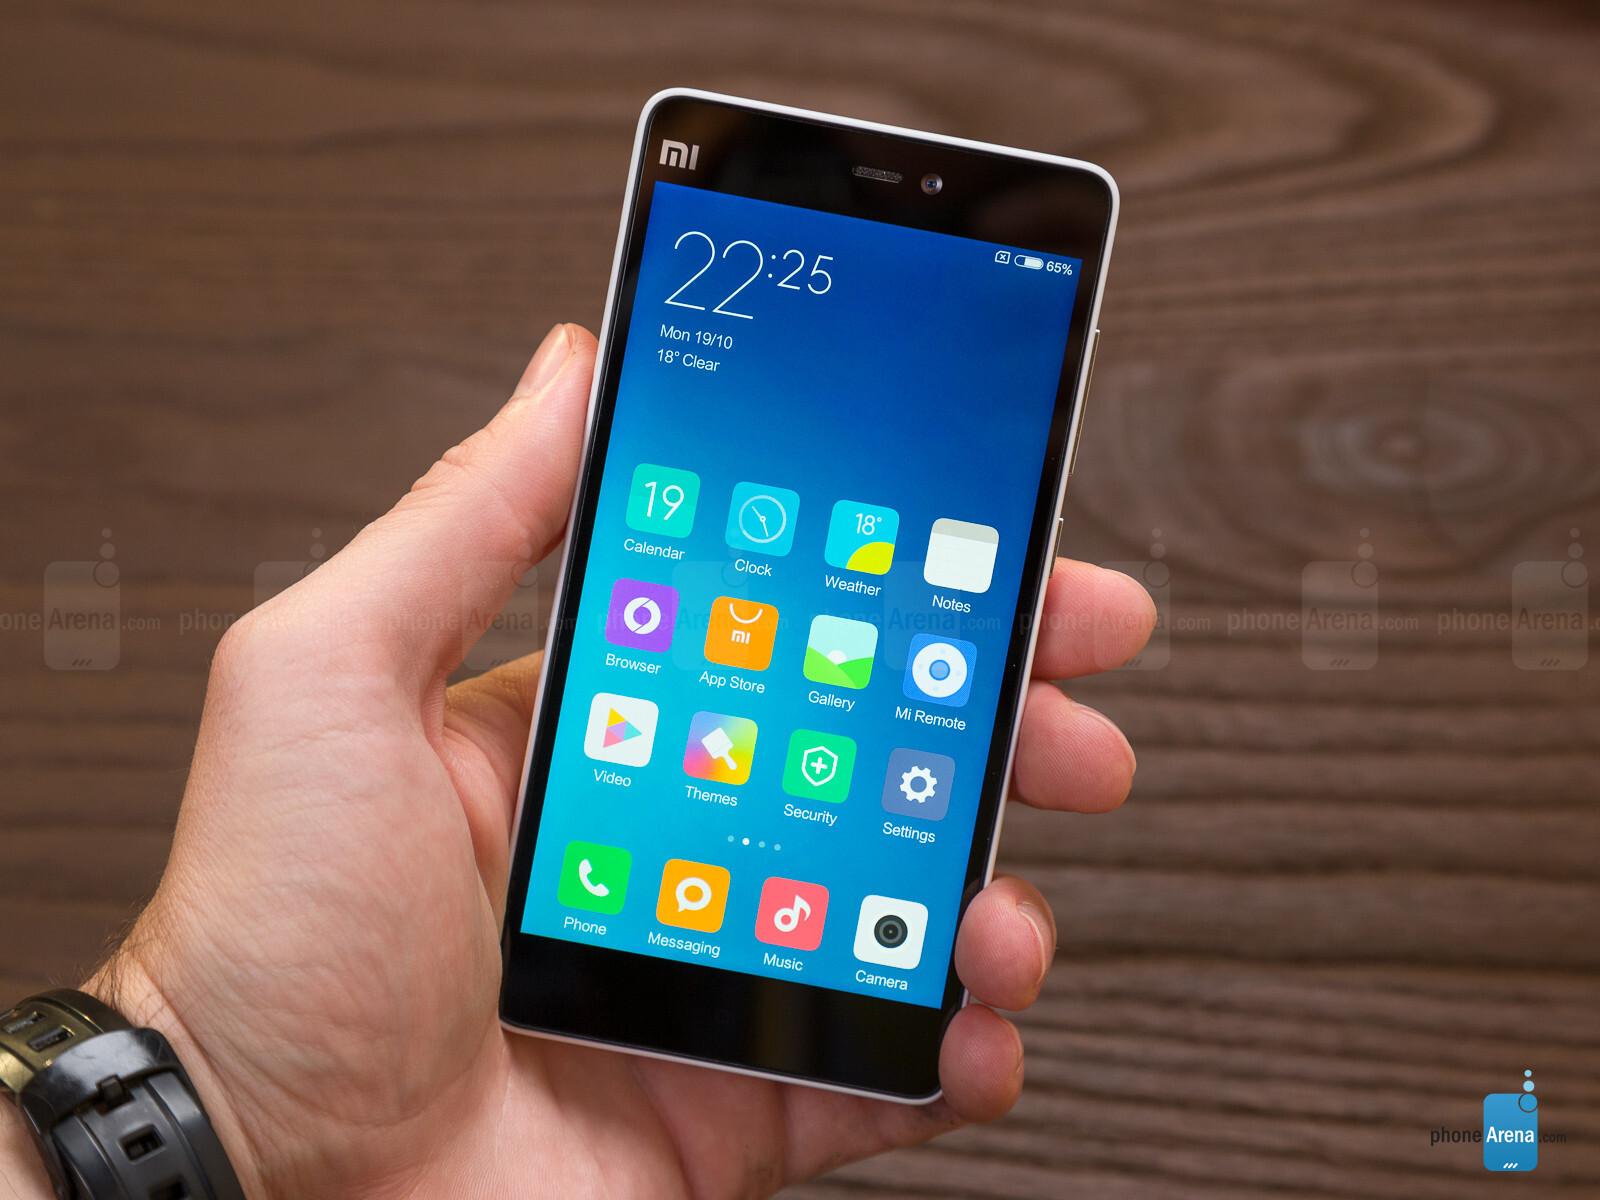 Xiaomi Mi 4c Review - PhoneArena